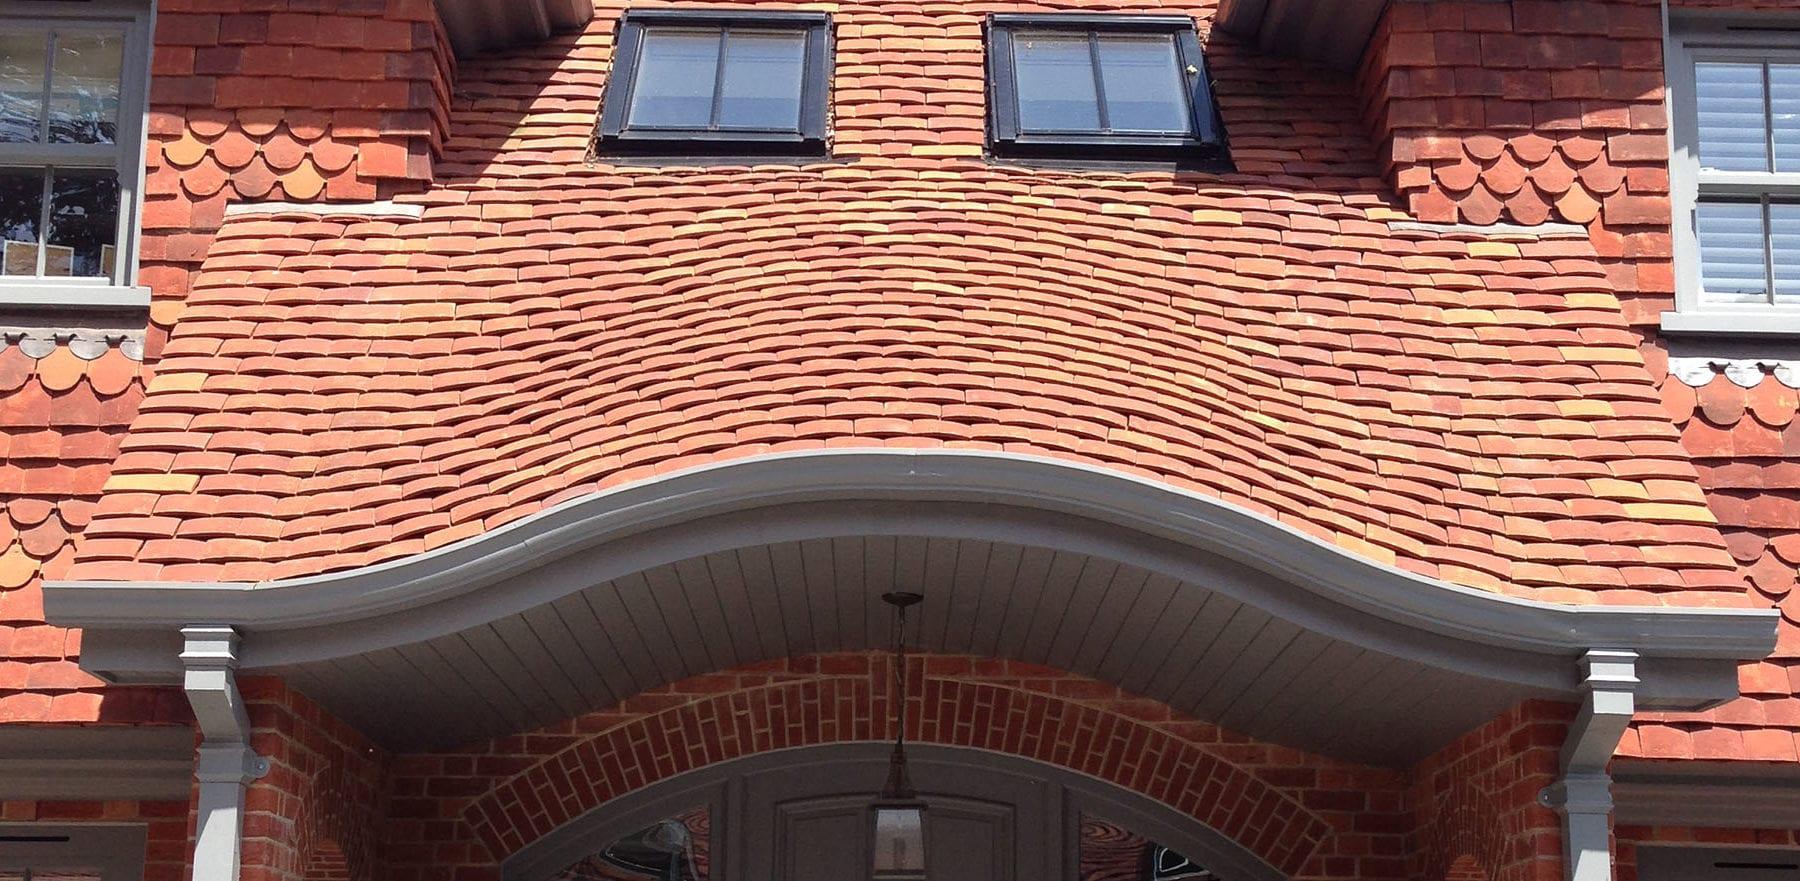 Lifestiles - Handmade Bespoke Clay Roof Tiles - Chichester, England 4